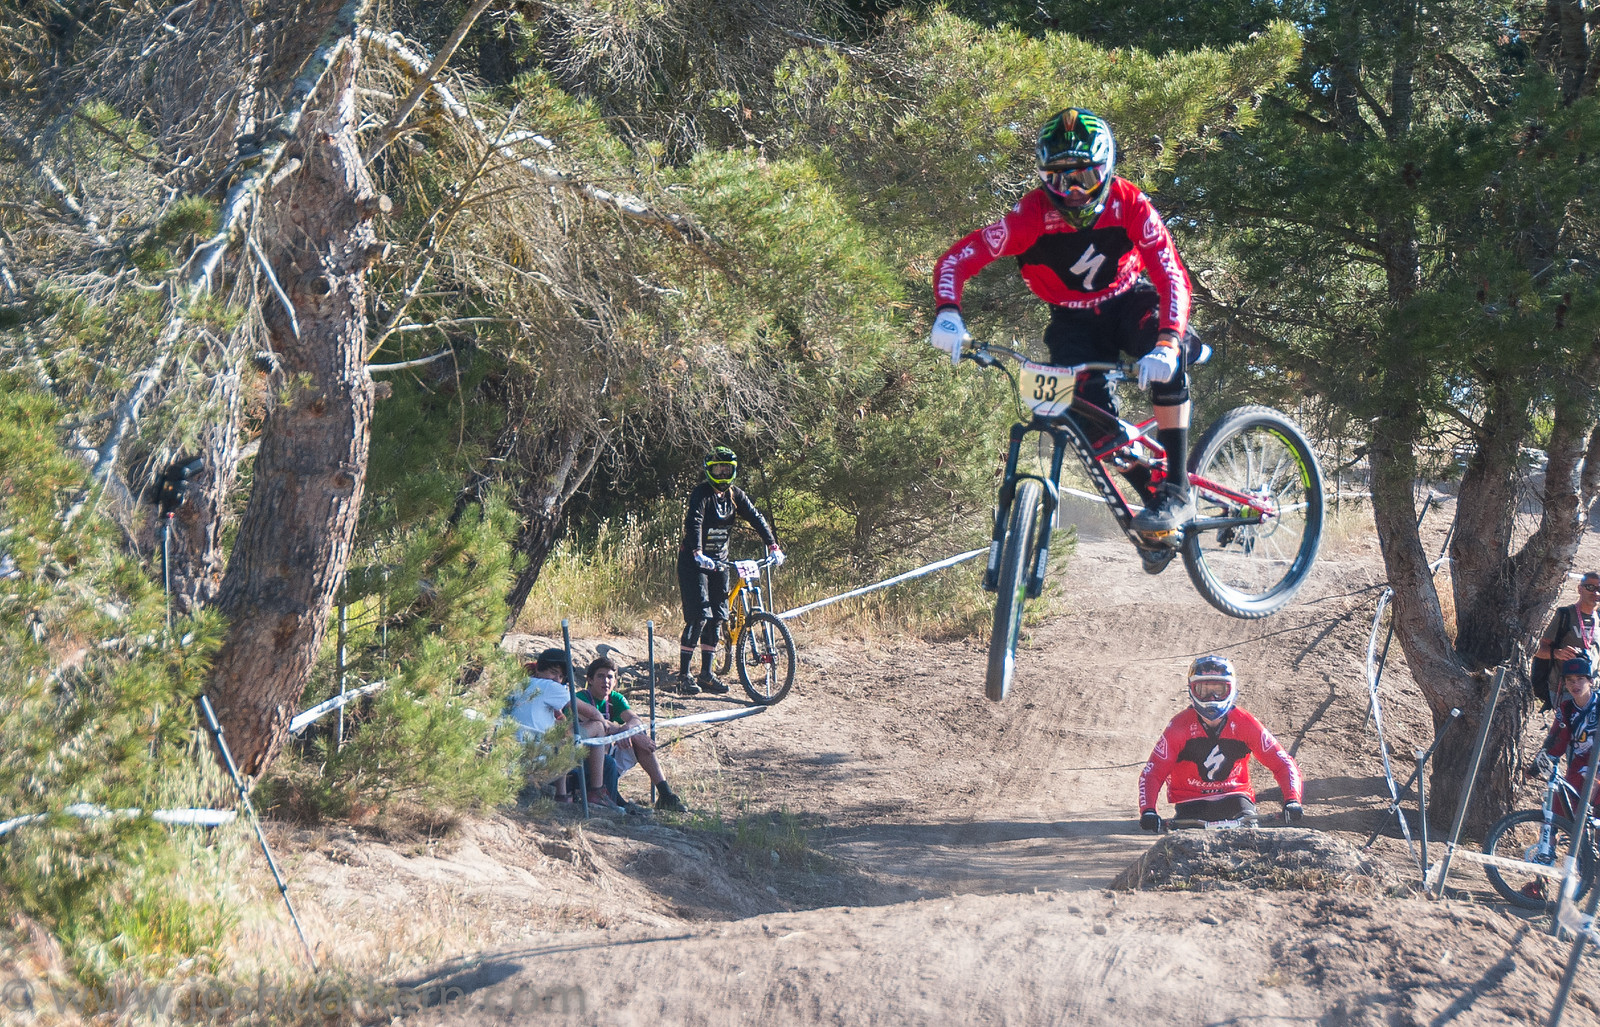 4-19-13DHPractice (5 of 36) - jkern620 - Mountain Biking Pictures - Vital MTB